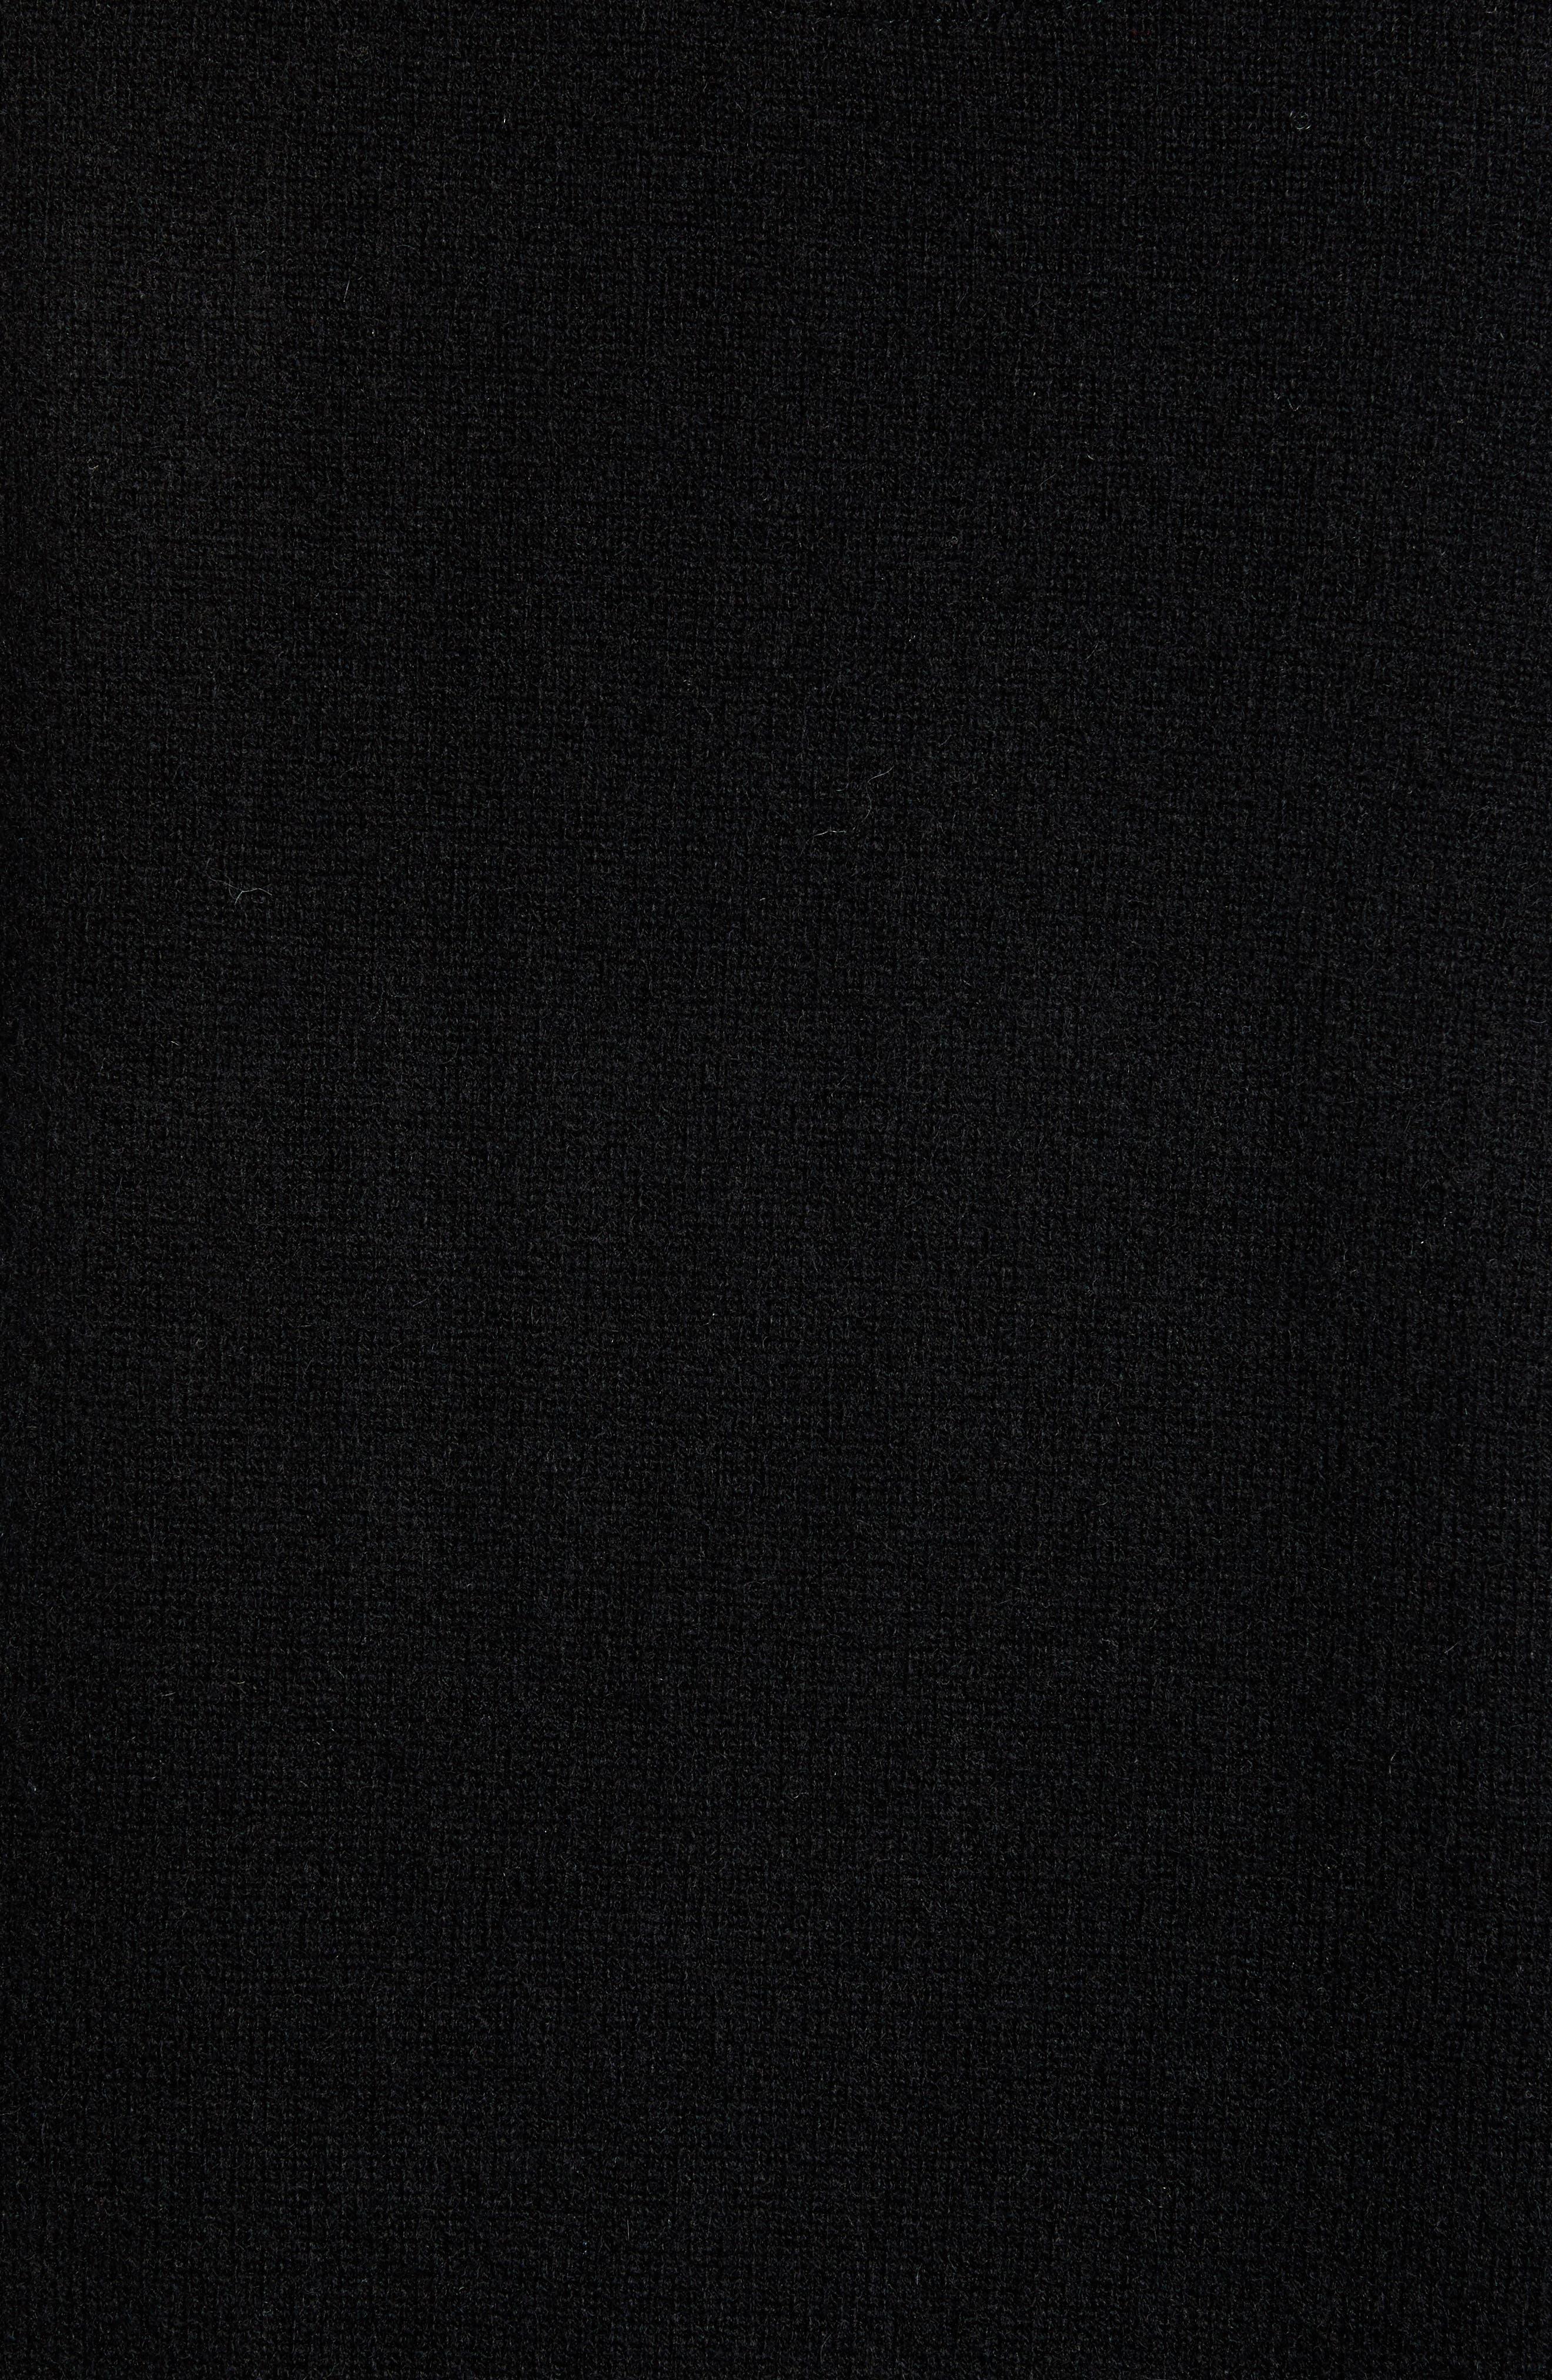 Cashmere V-Neck Sweater Vest,                             Alternate thumbnail 5, color,                             BLACK CAVIAR